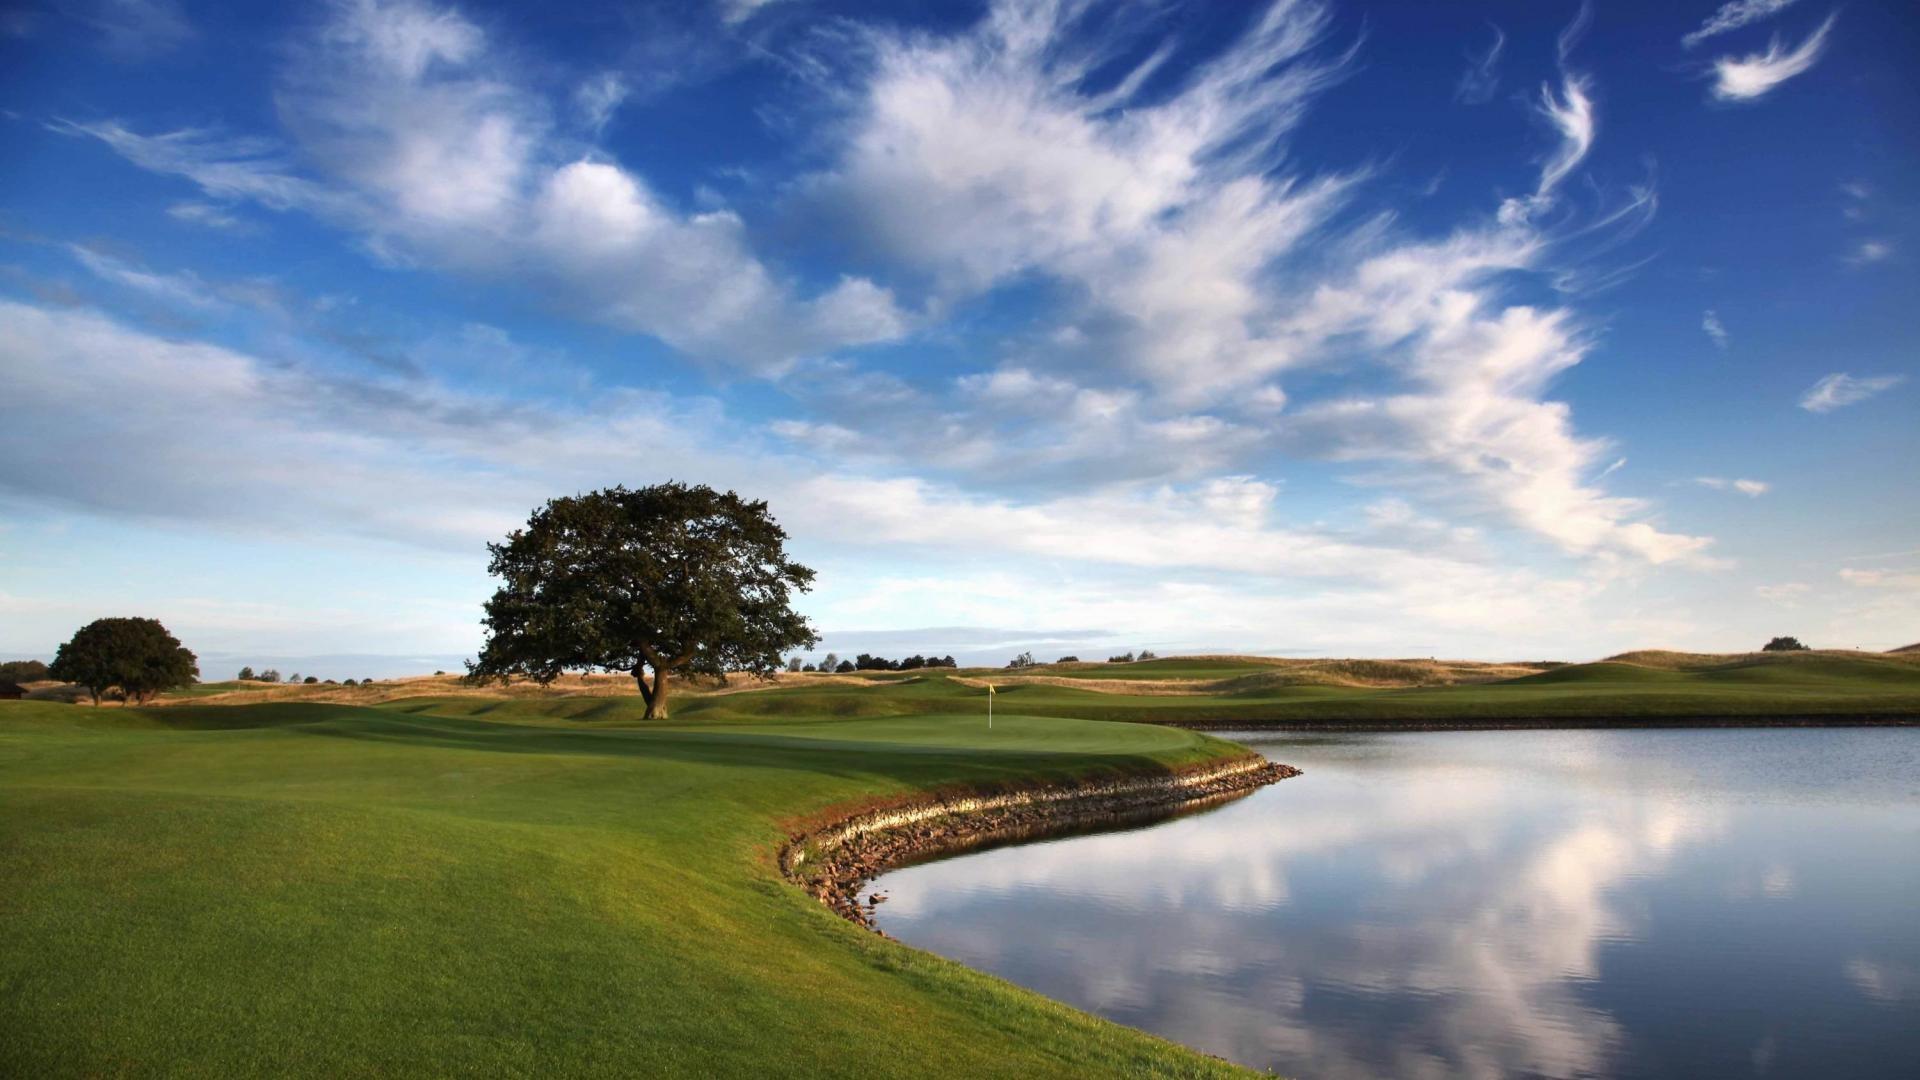 Golf Course Oxfordshire Wallpaper HD Golf